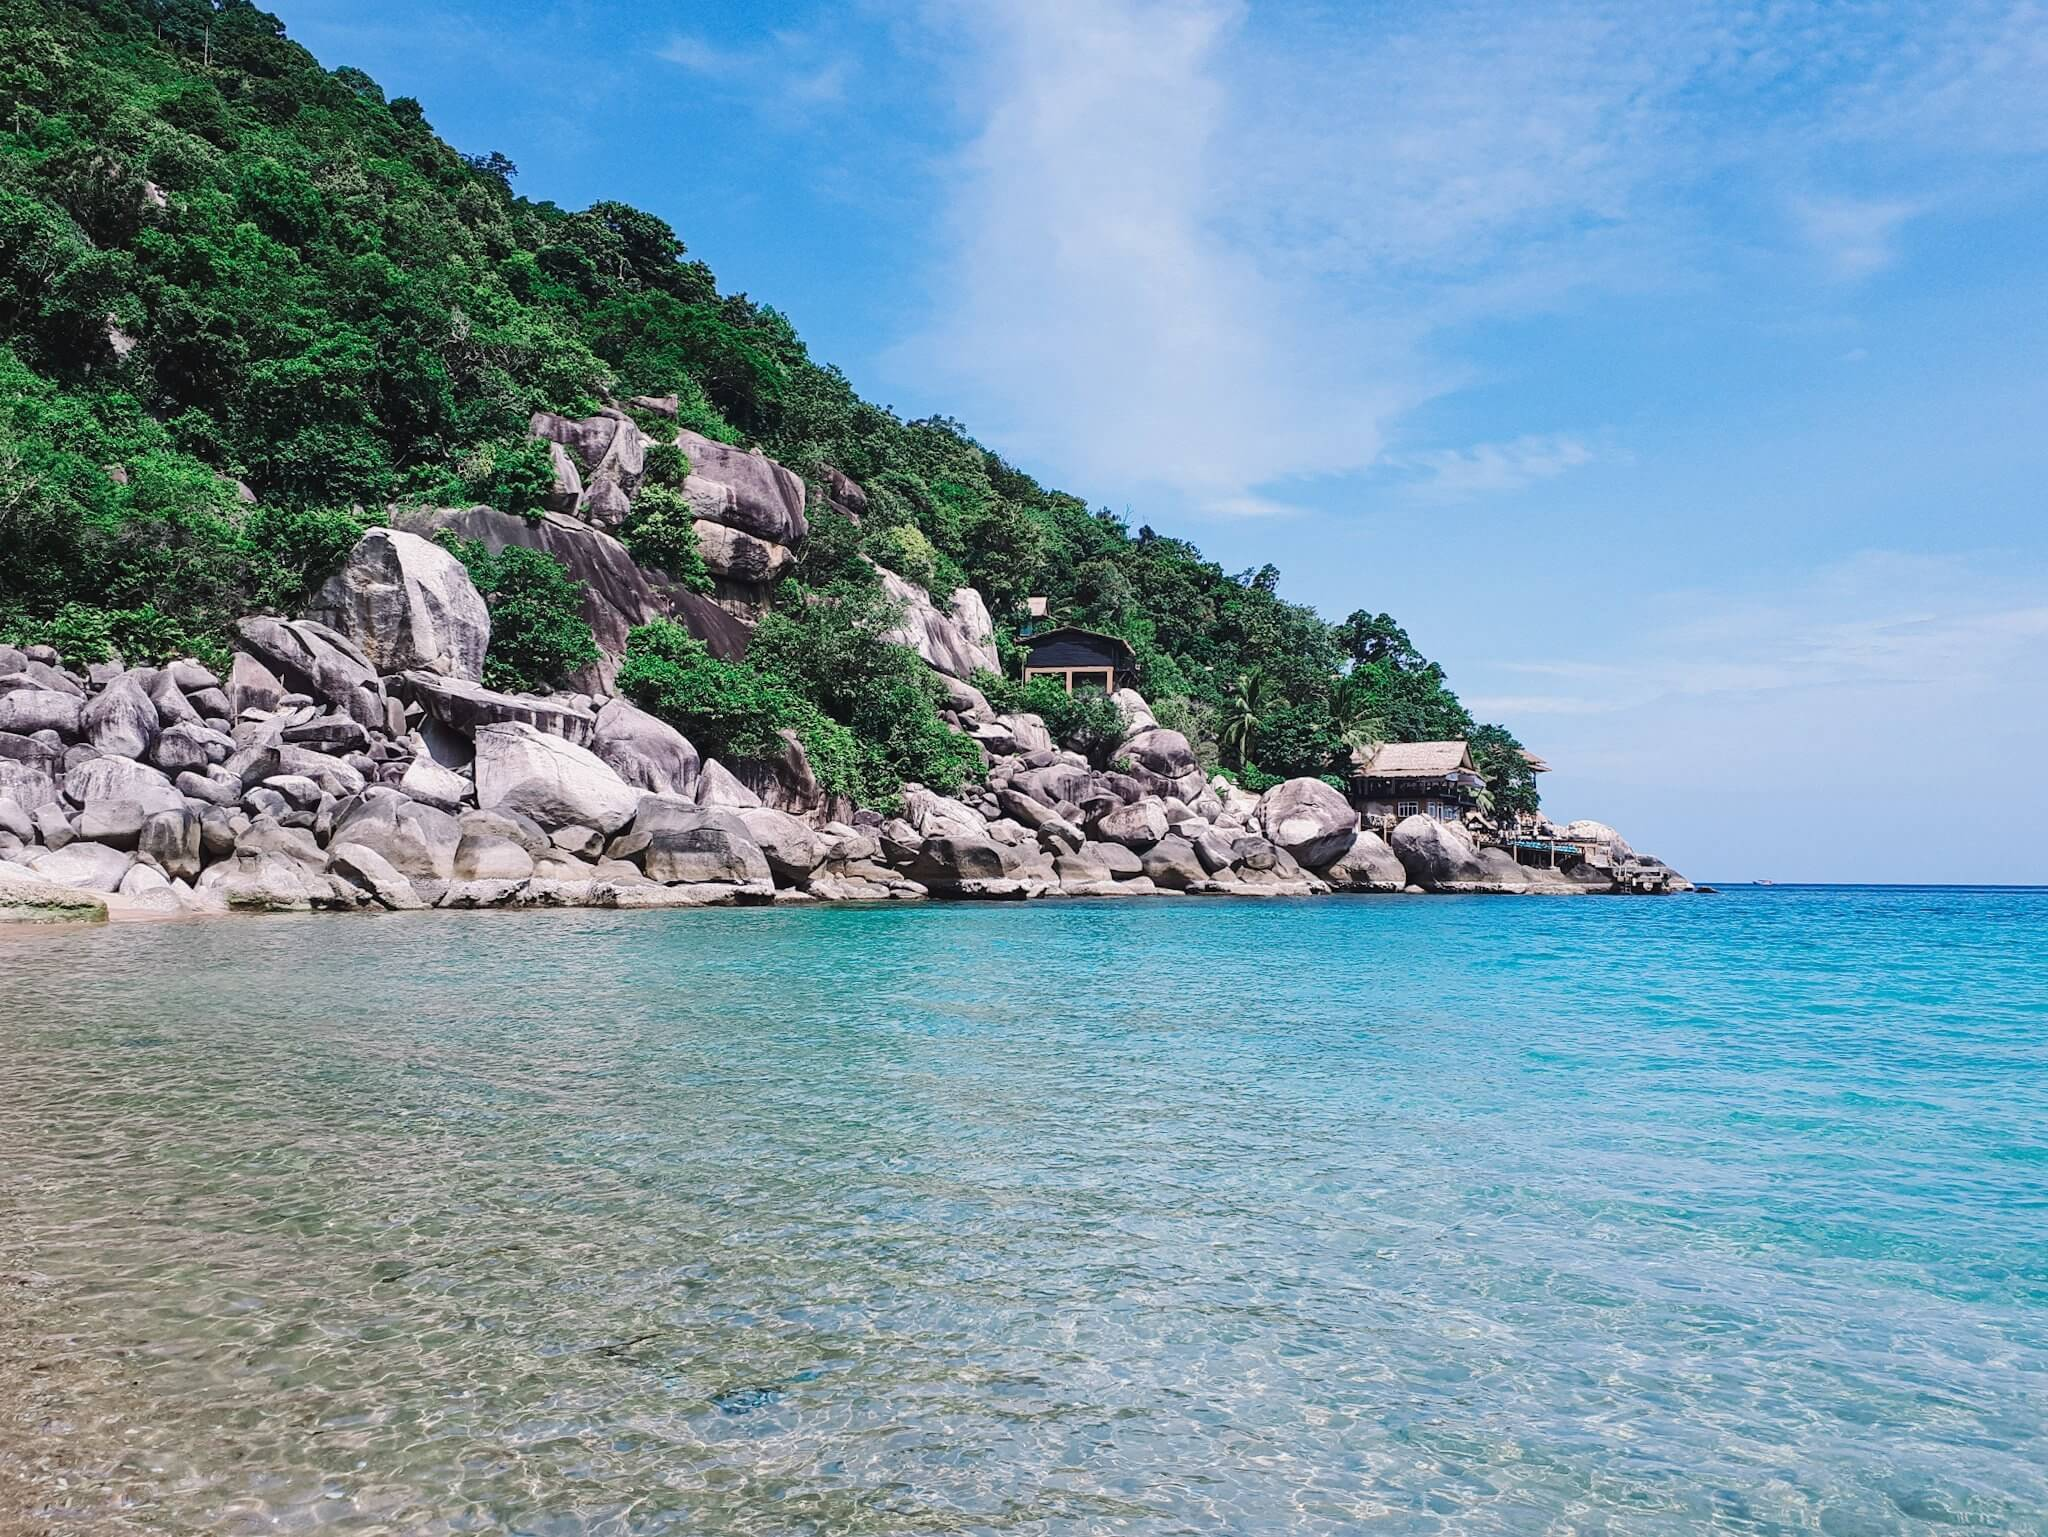 Maya bay on Koh Tao, Thailand.